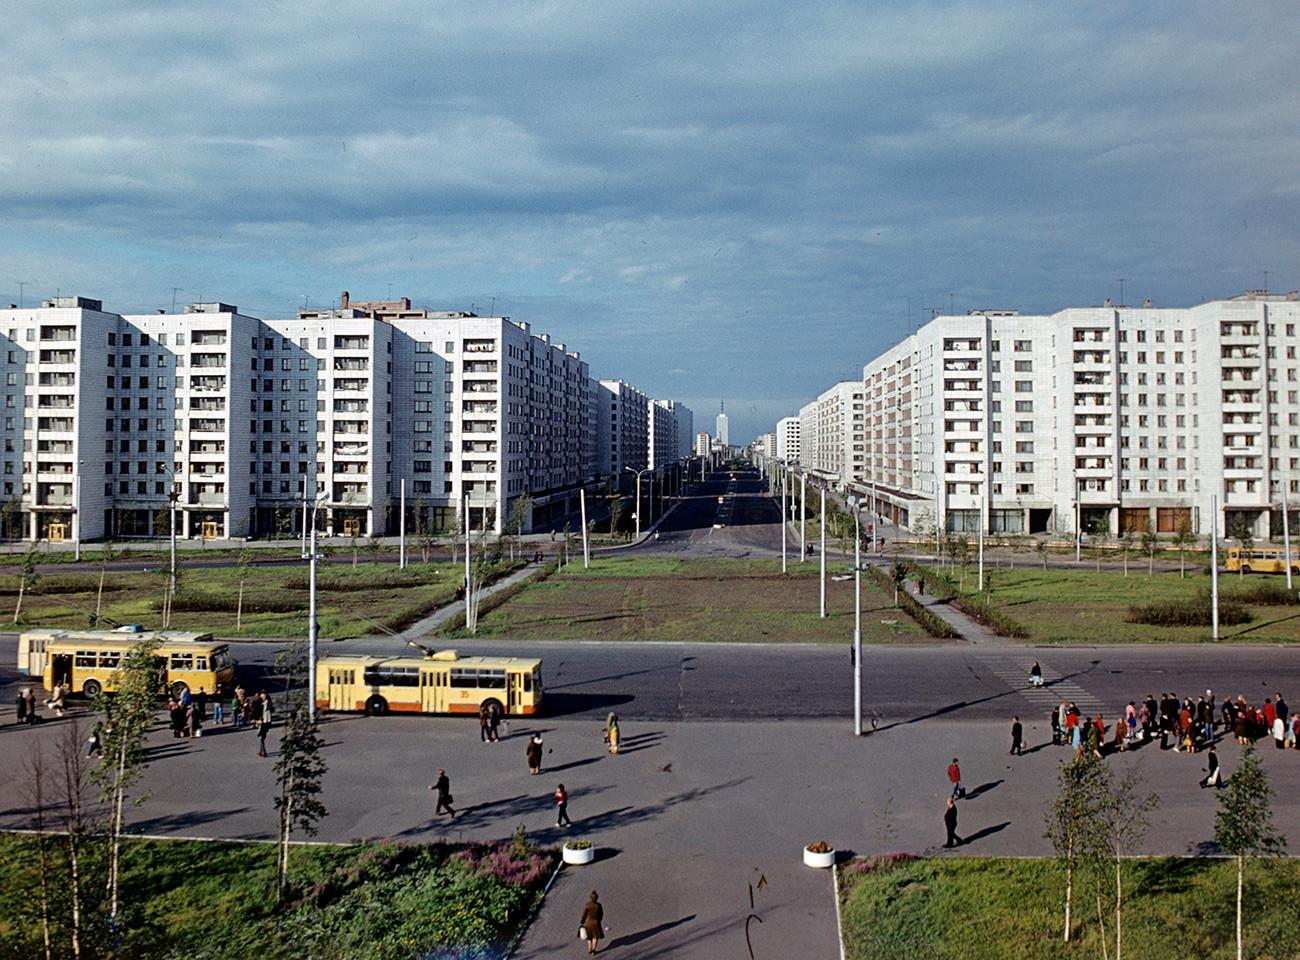 Nove brežnjevke leta 1981 v Arhangelsku na Engelsovi ulici